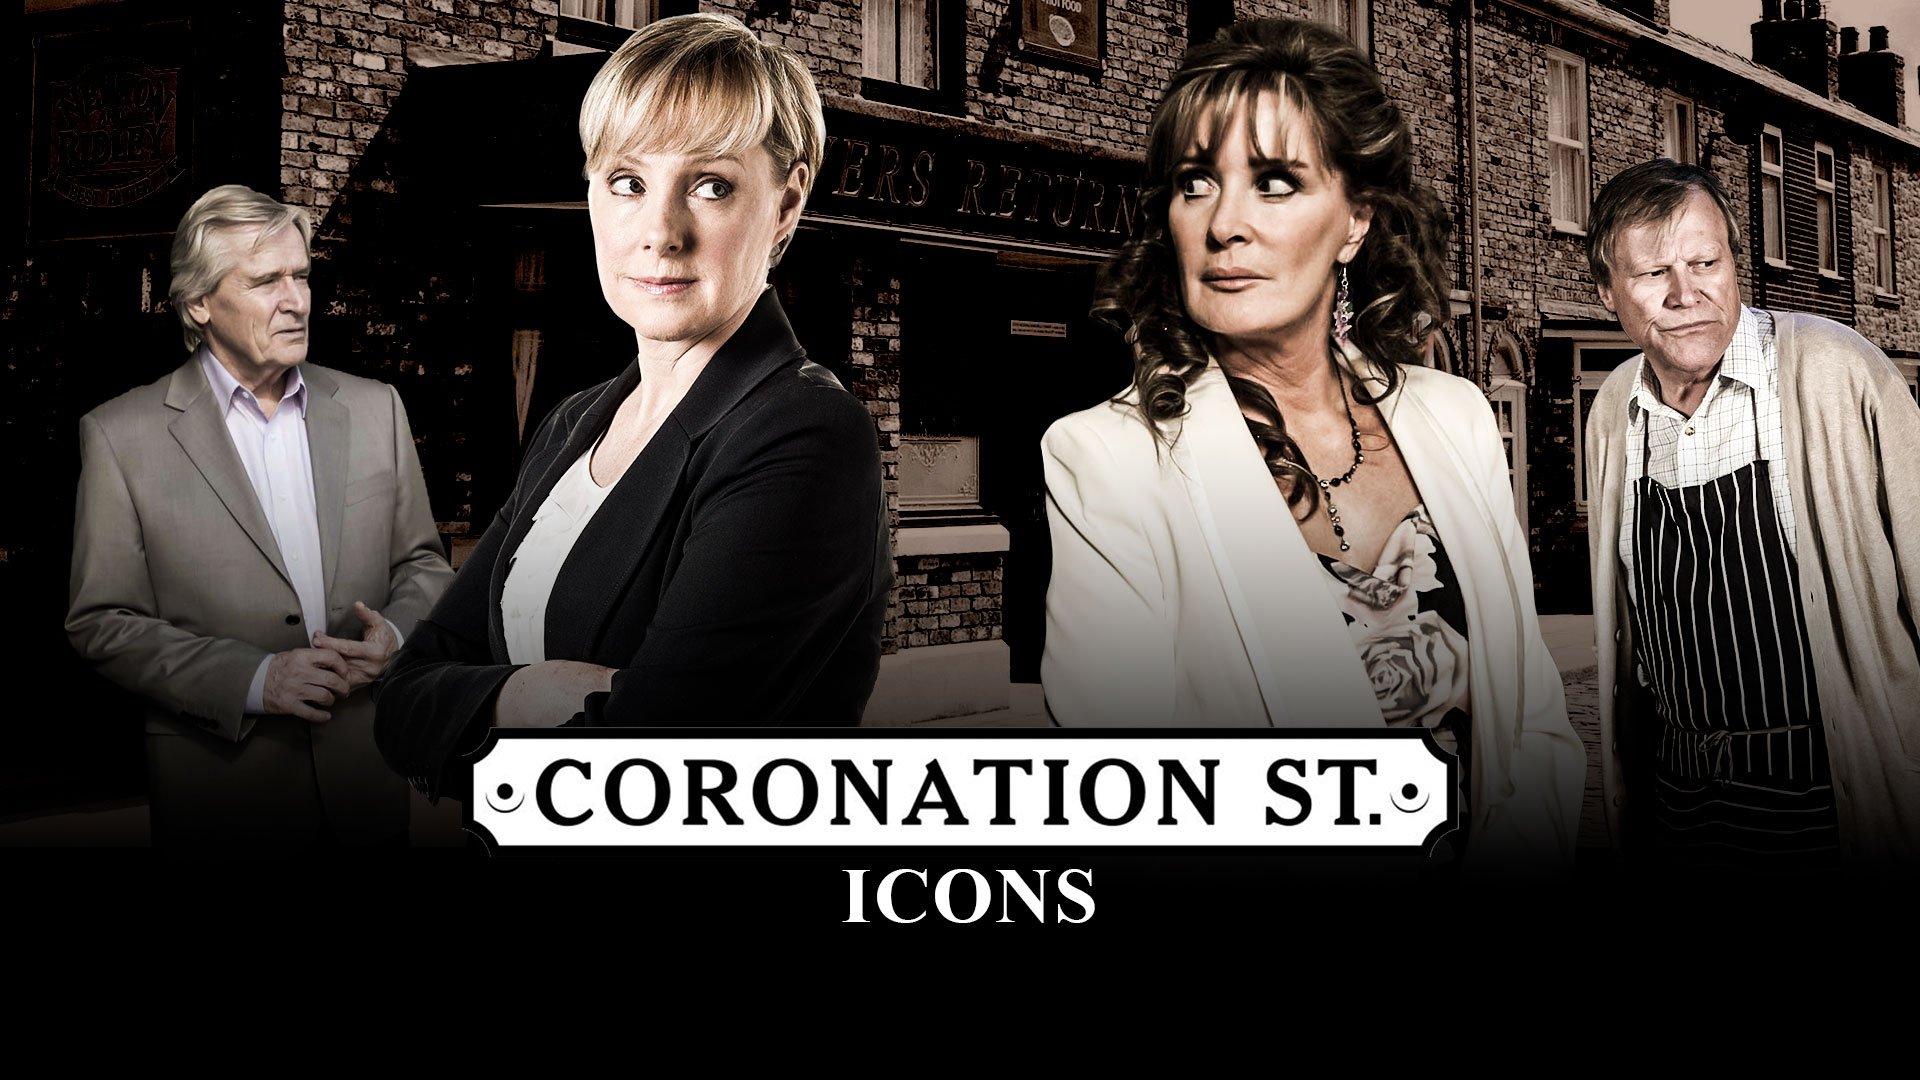 Coronation Street Icons on BritBox UK